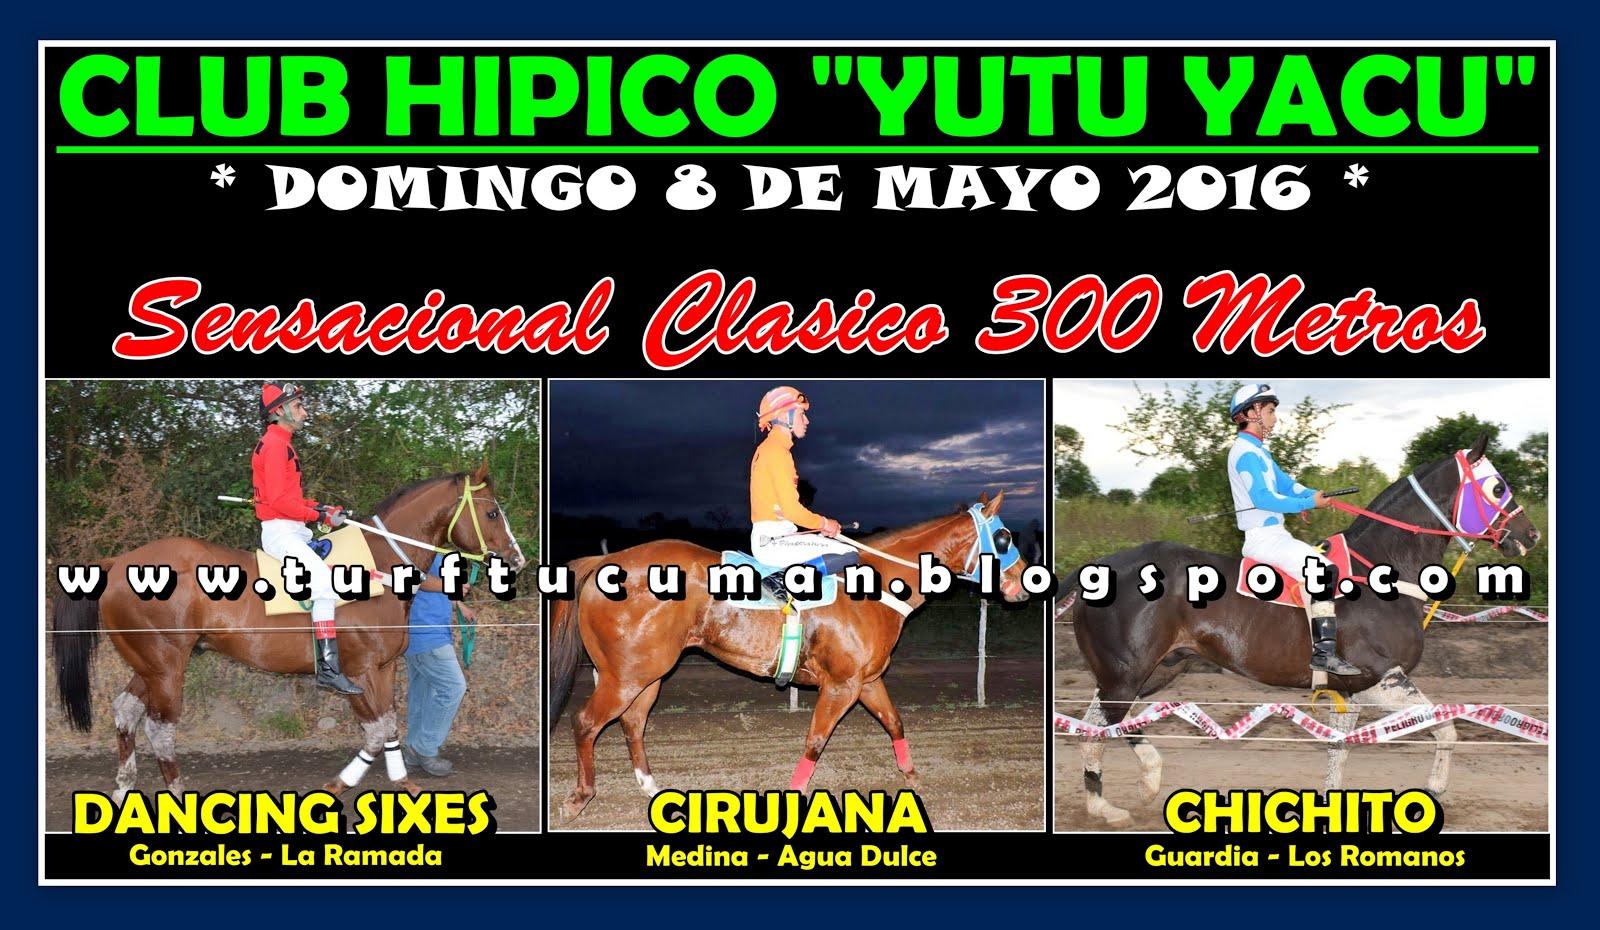 CIRUJANA DANCING CHICHITO